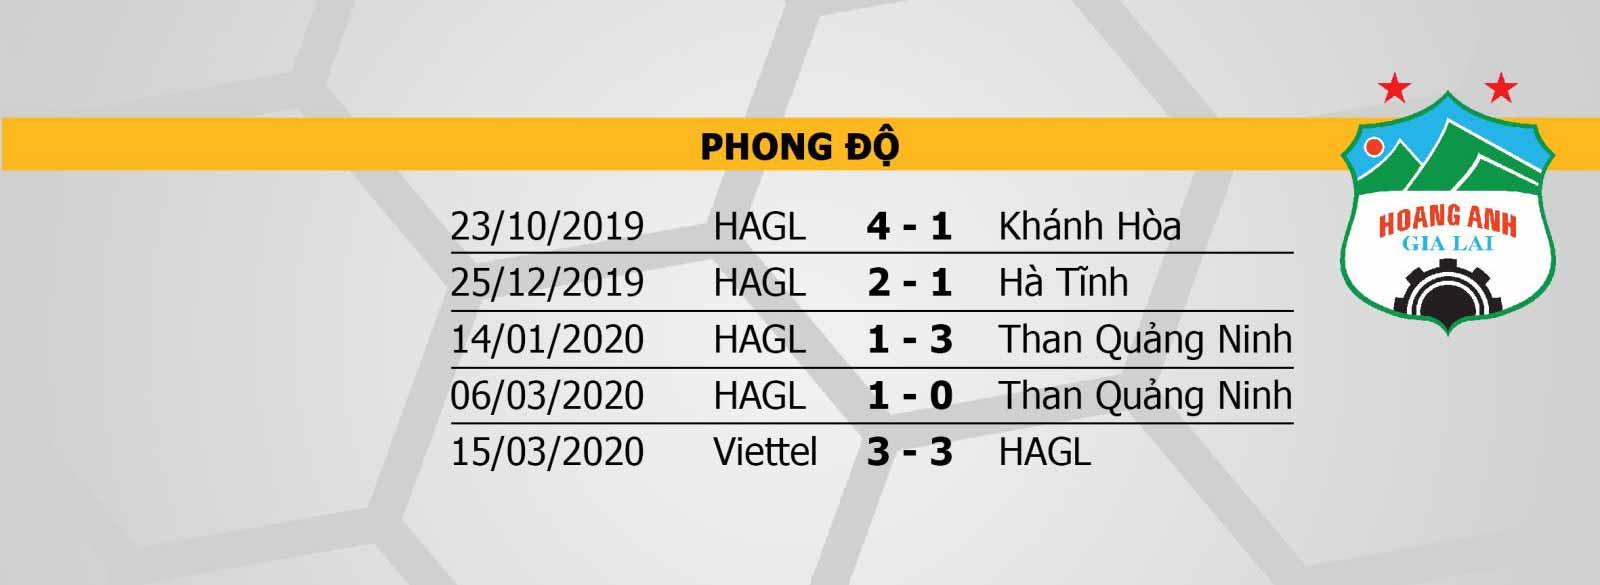 PHONG-DO-HAGL